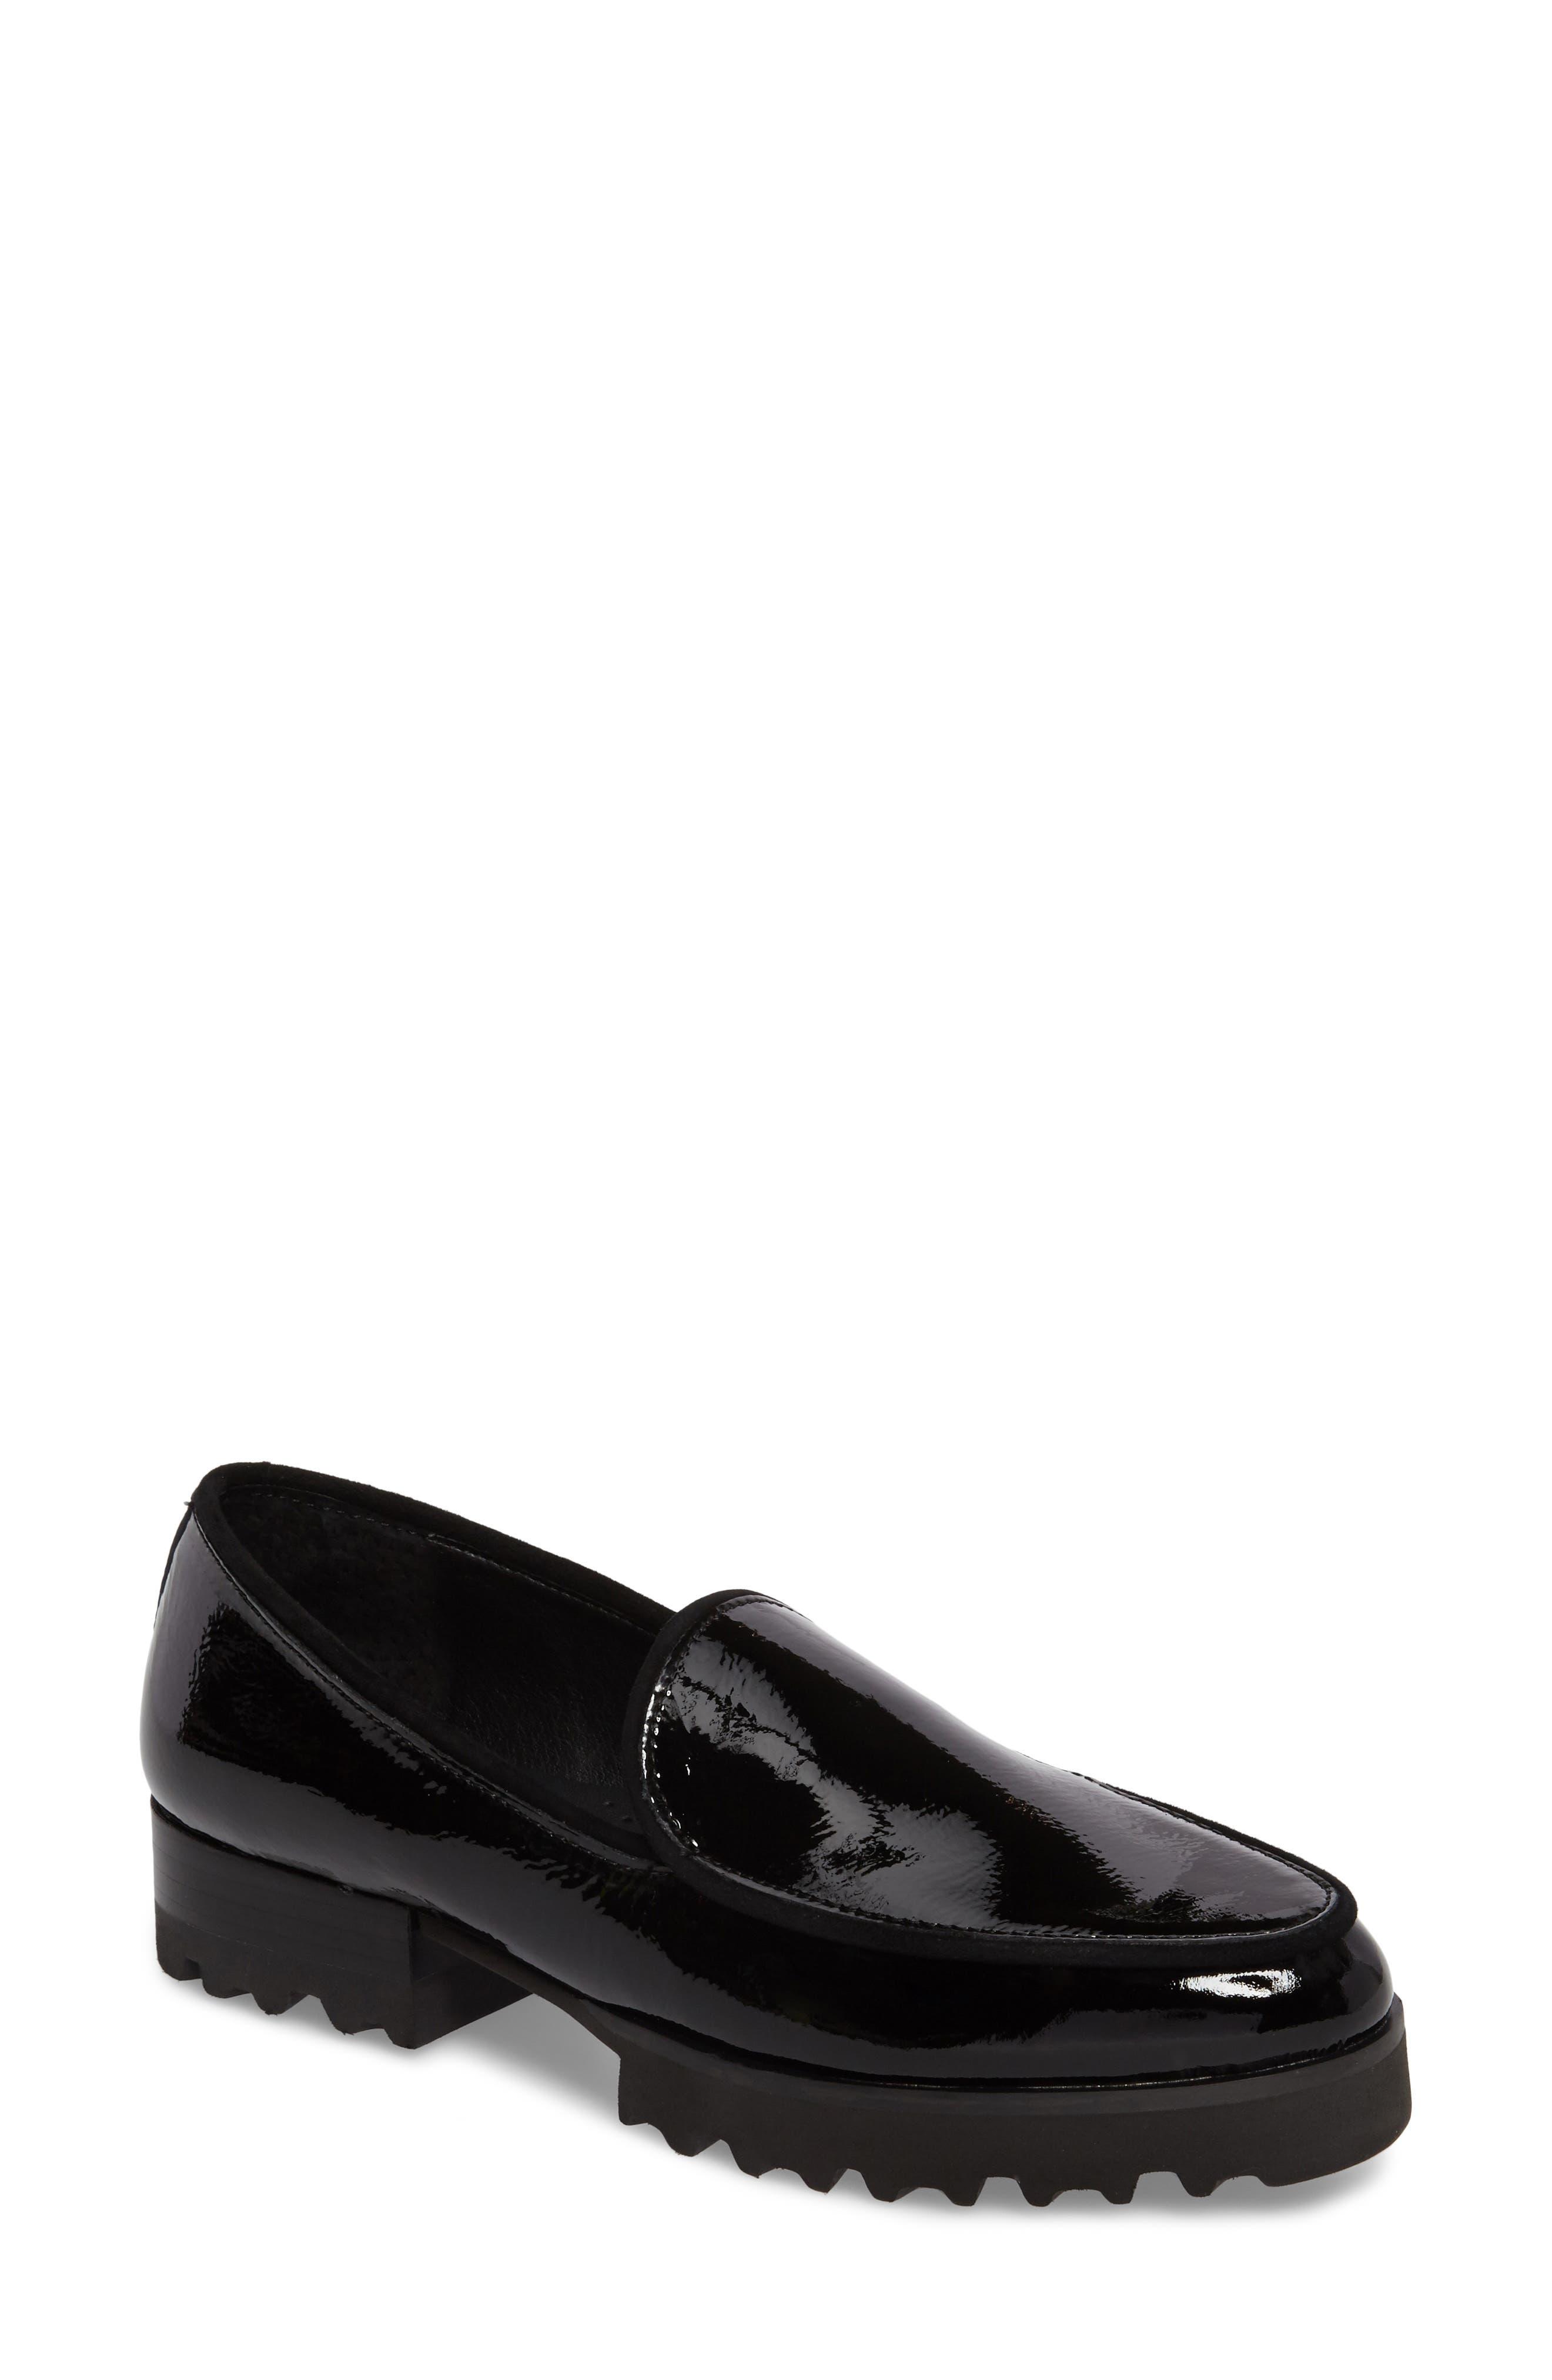 Elen Loafer,                             Main thumbnail 1, color,                             Black Leather